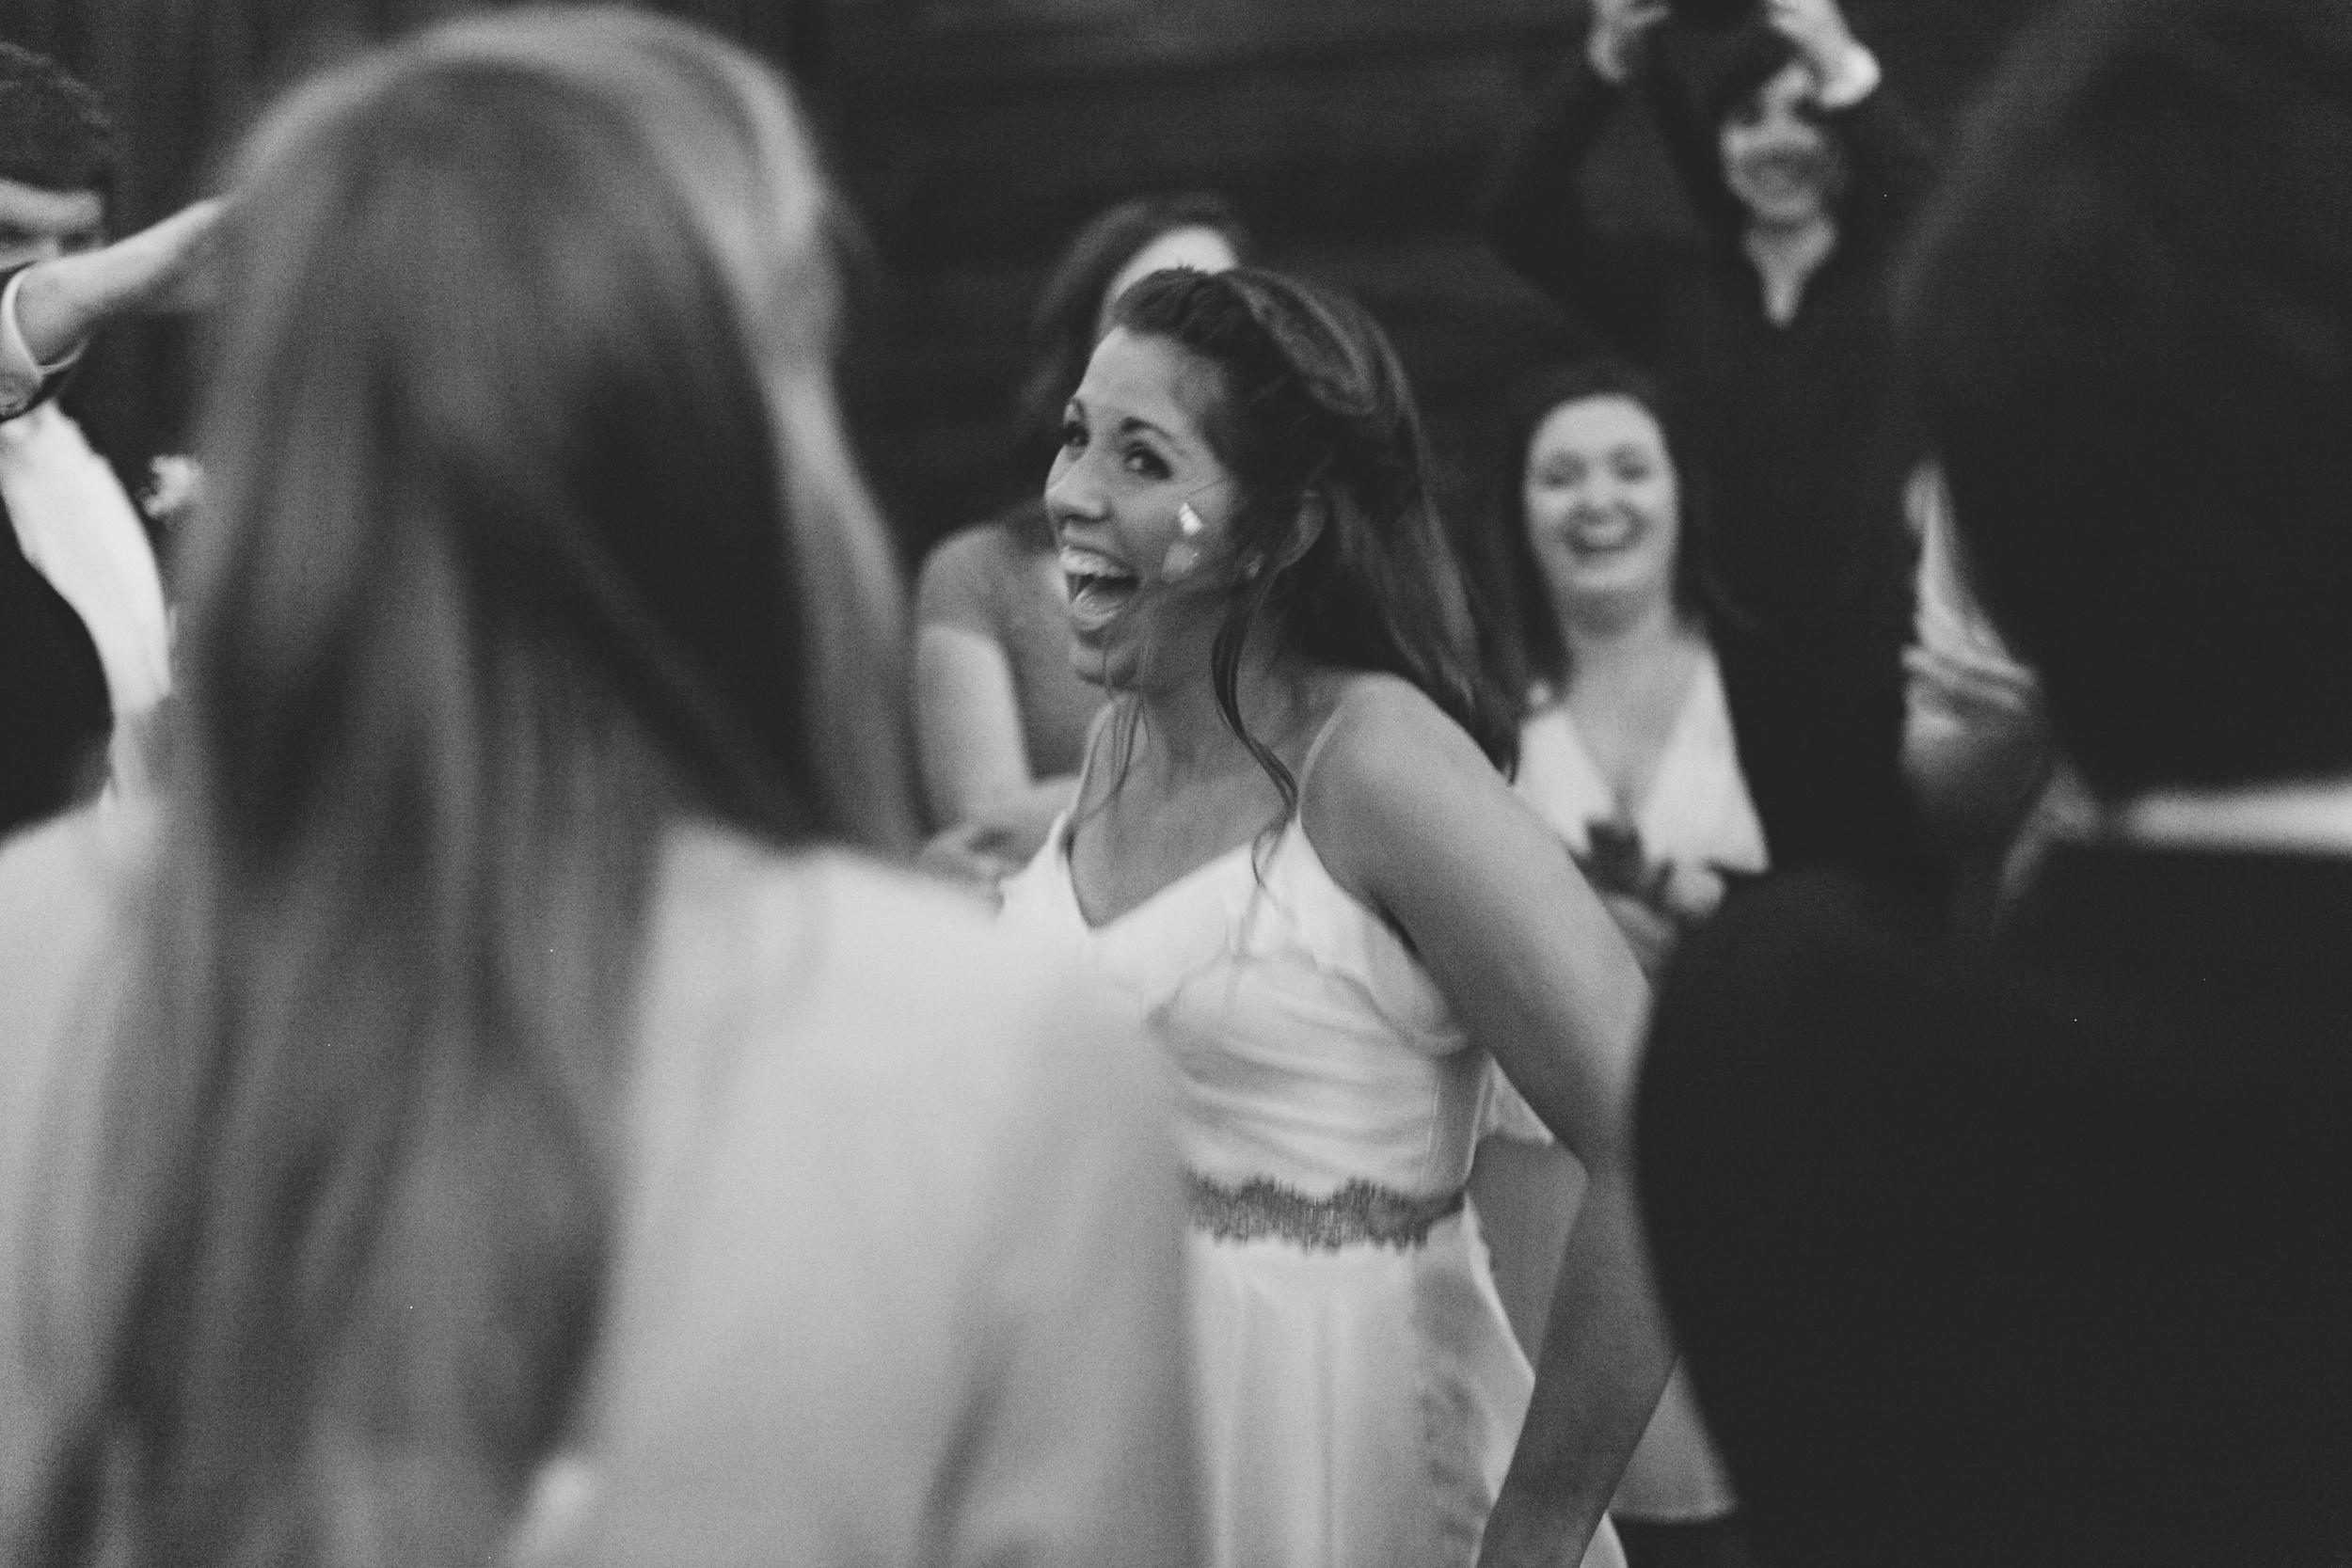 Kathryn-McCrary-Photography-Atlanta-Wedding-Photographer-83.jpg